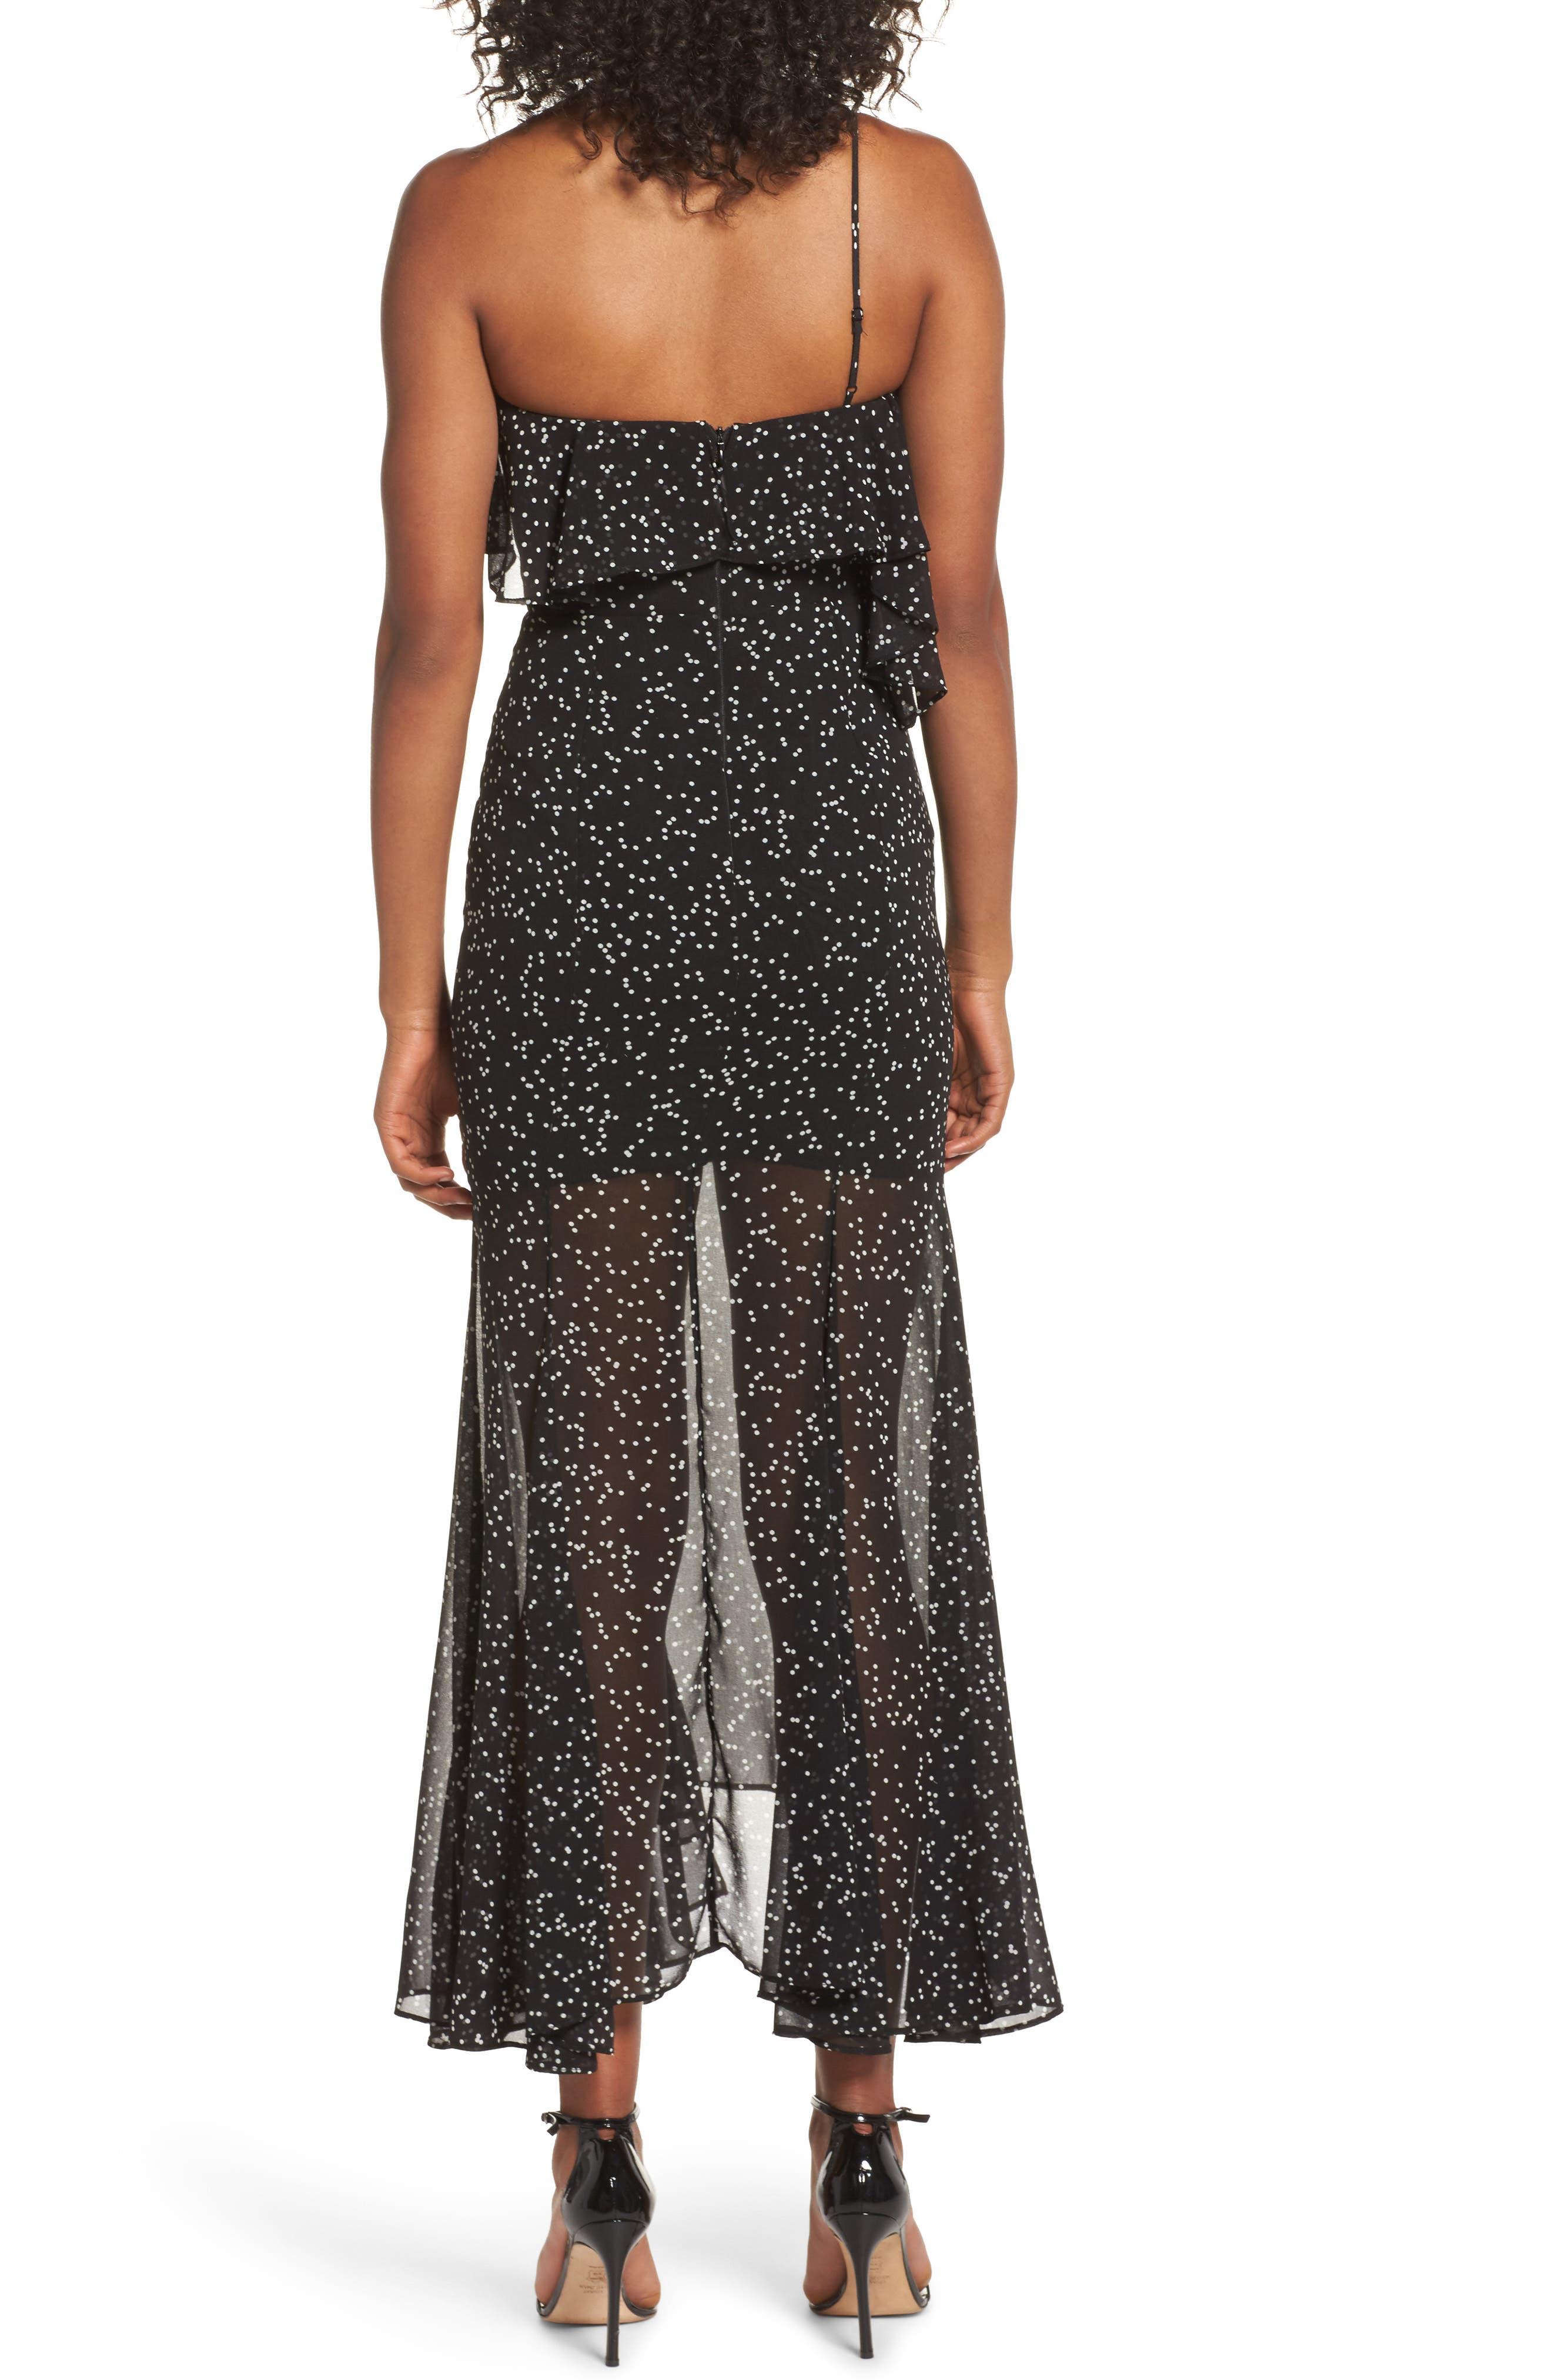 Embrace One Shoulder Dress,                             Alternate thumbnail 3, color,                             Black W White Spot